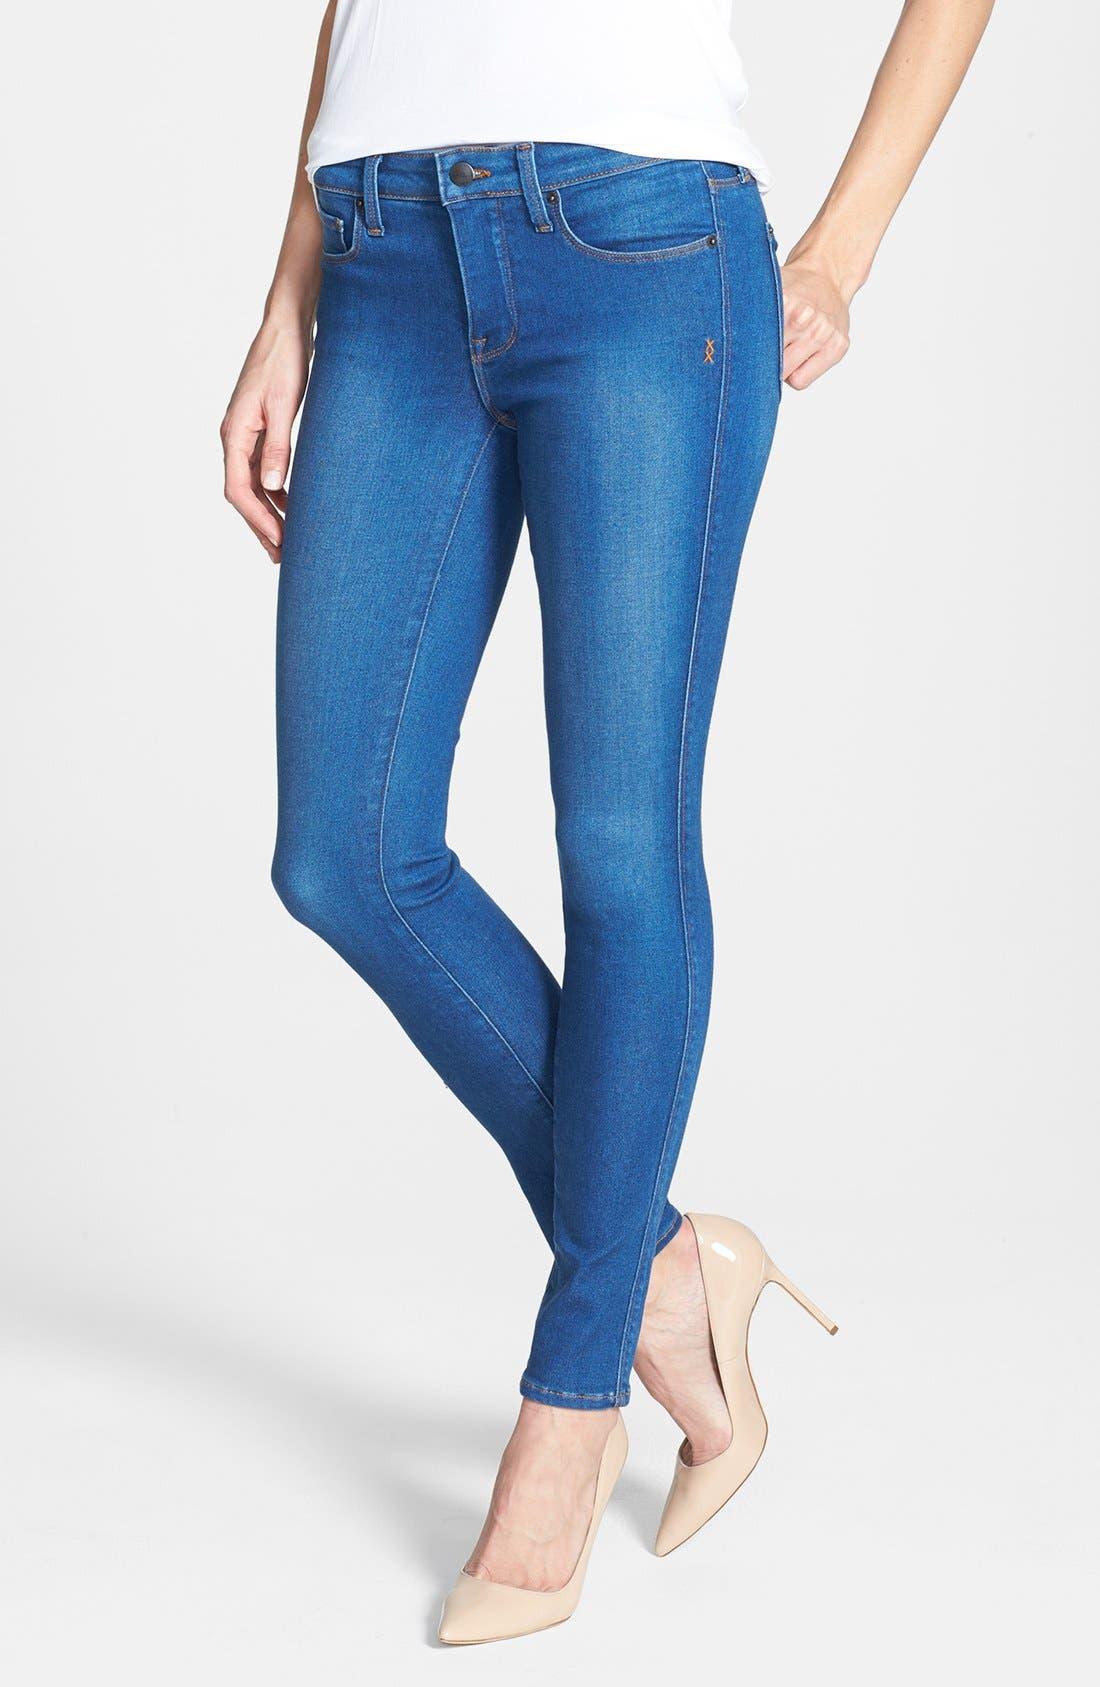 Main Image - Genetic 'Shya' Cigarette Skinny Jeans (Impact)